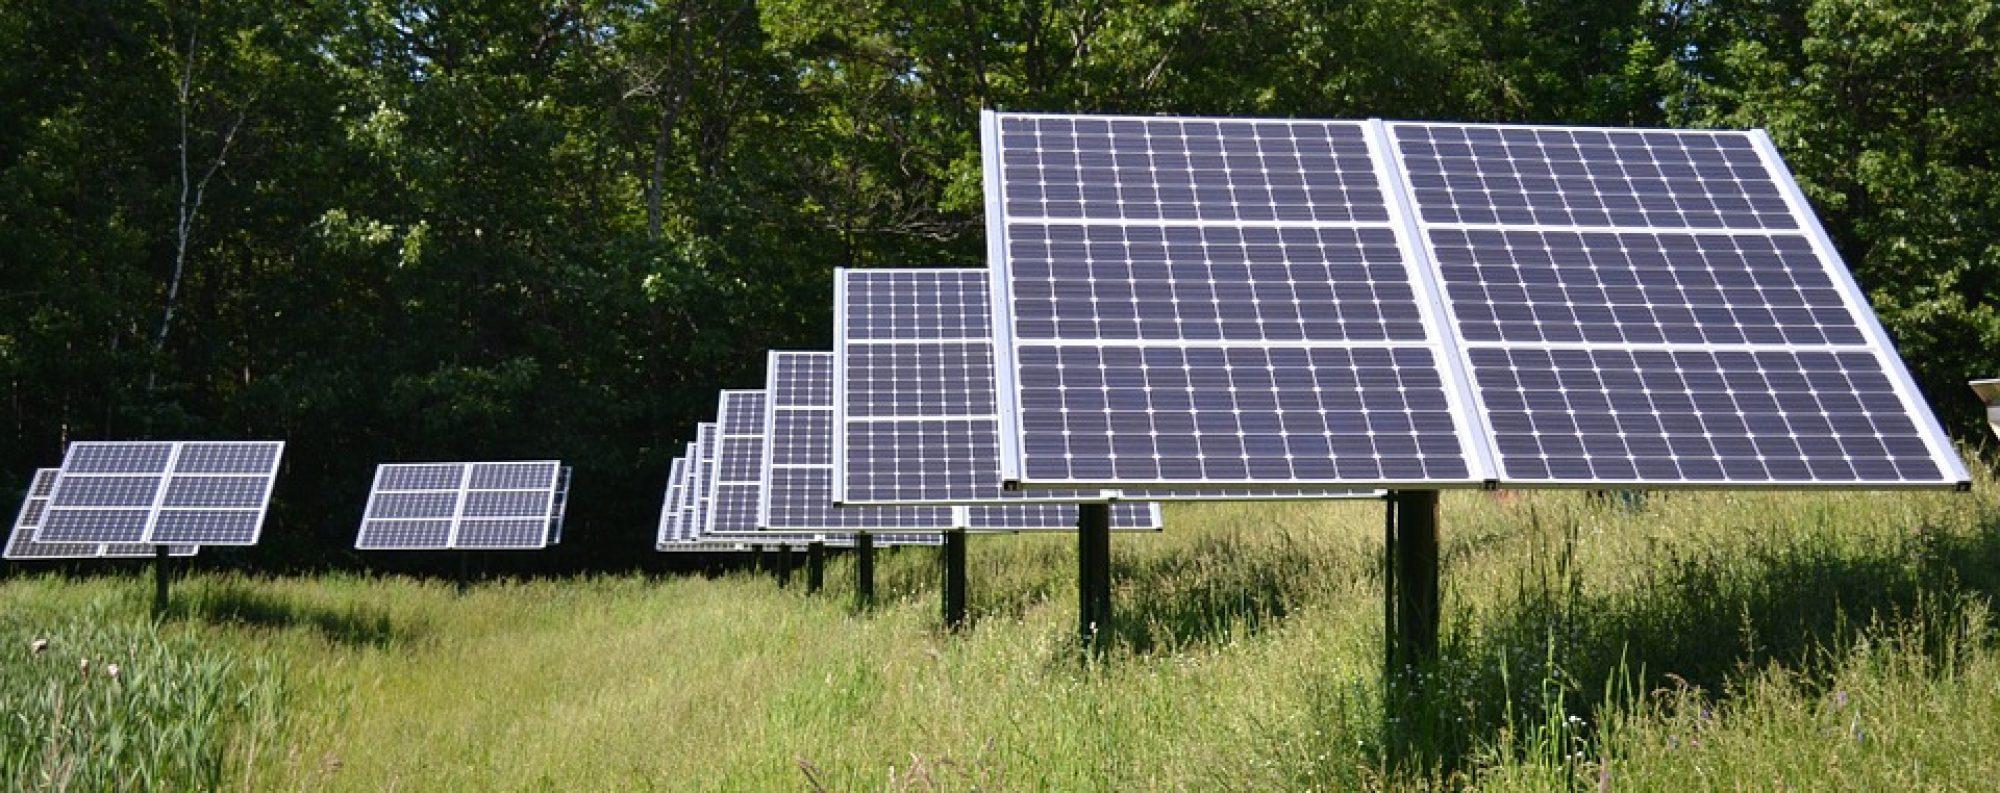 Free 2 Solar Energy